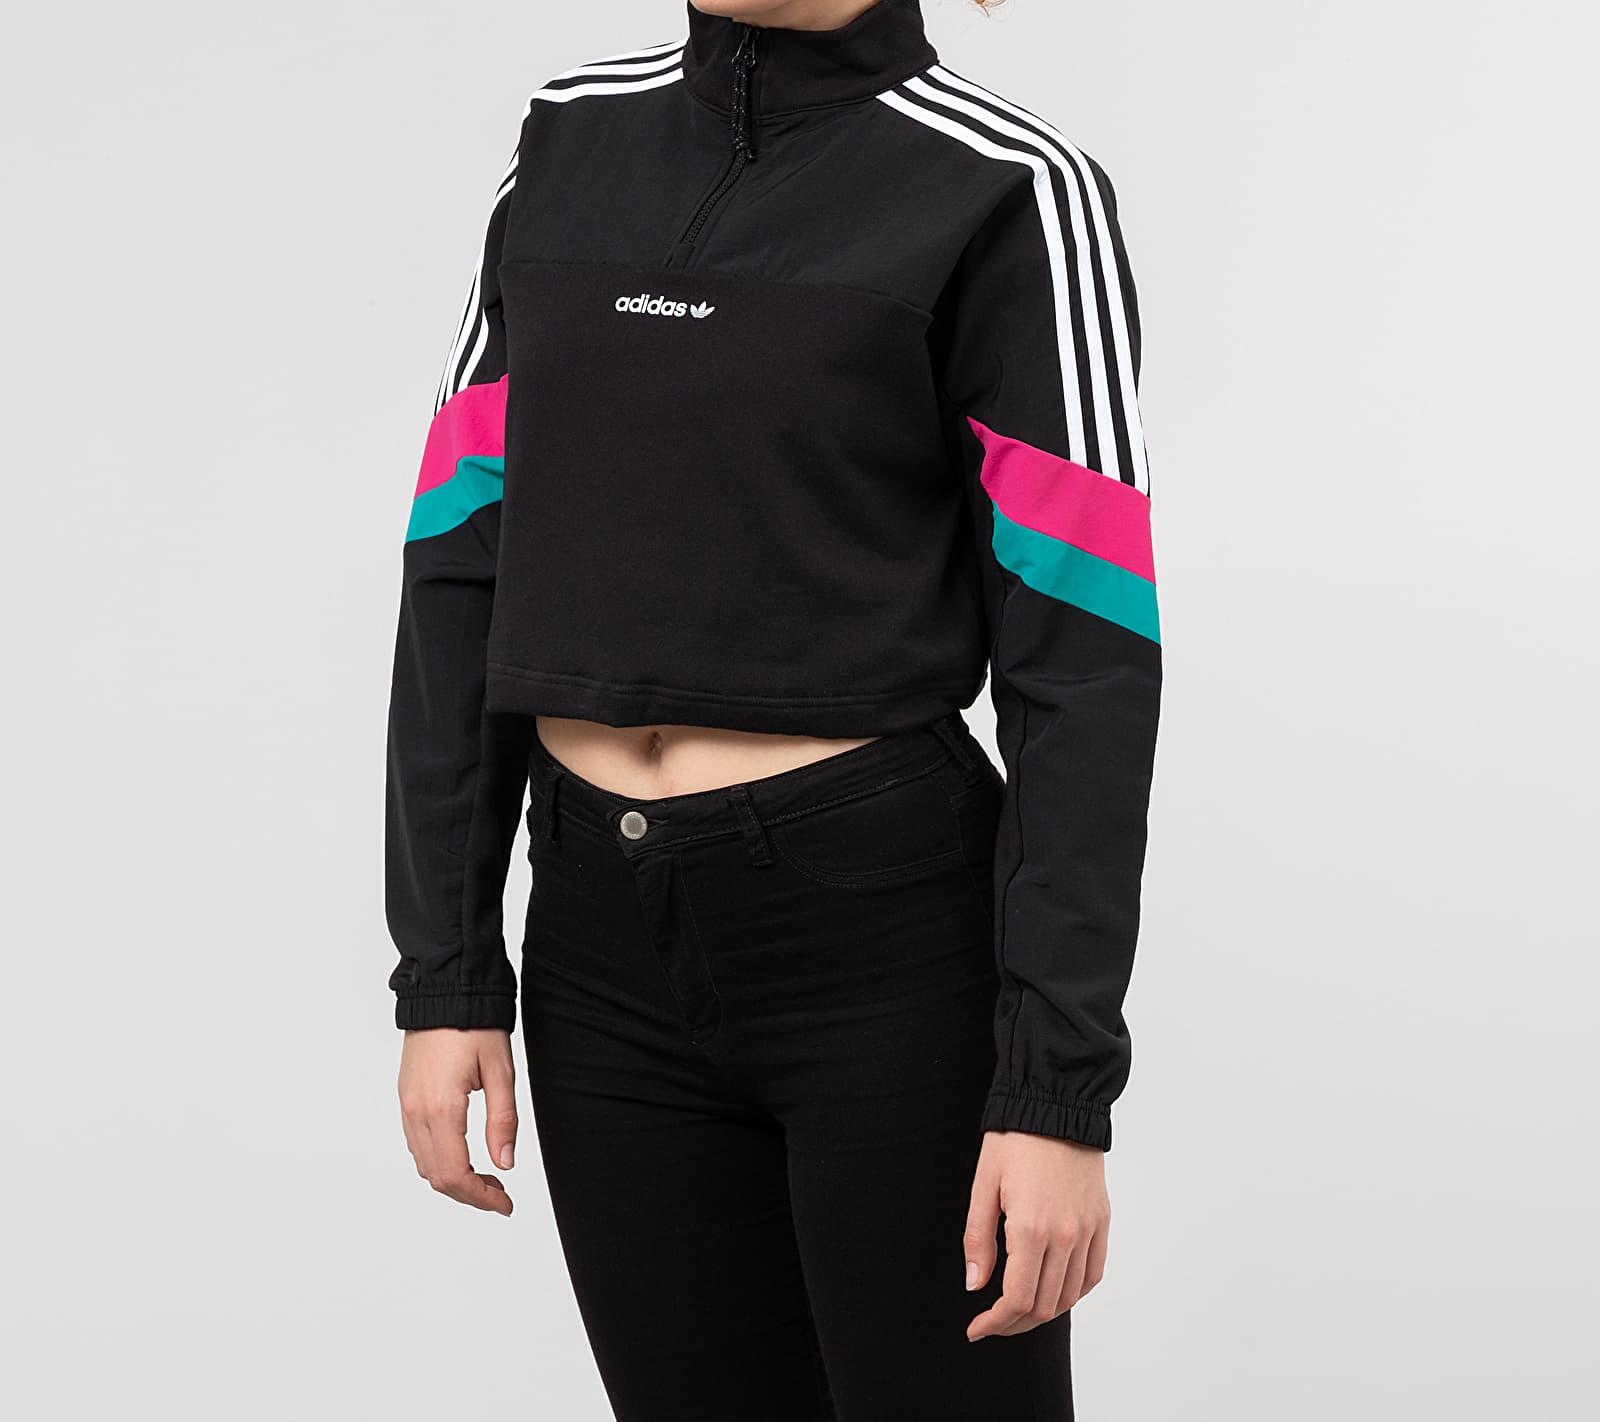 adidas Cropped Top Black